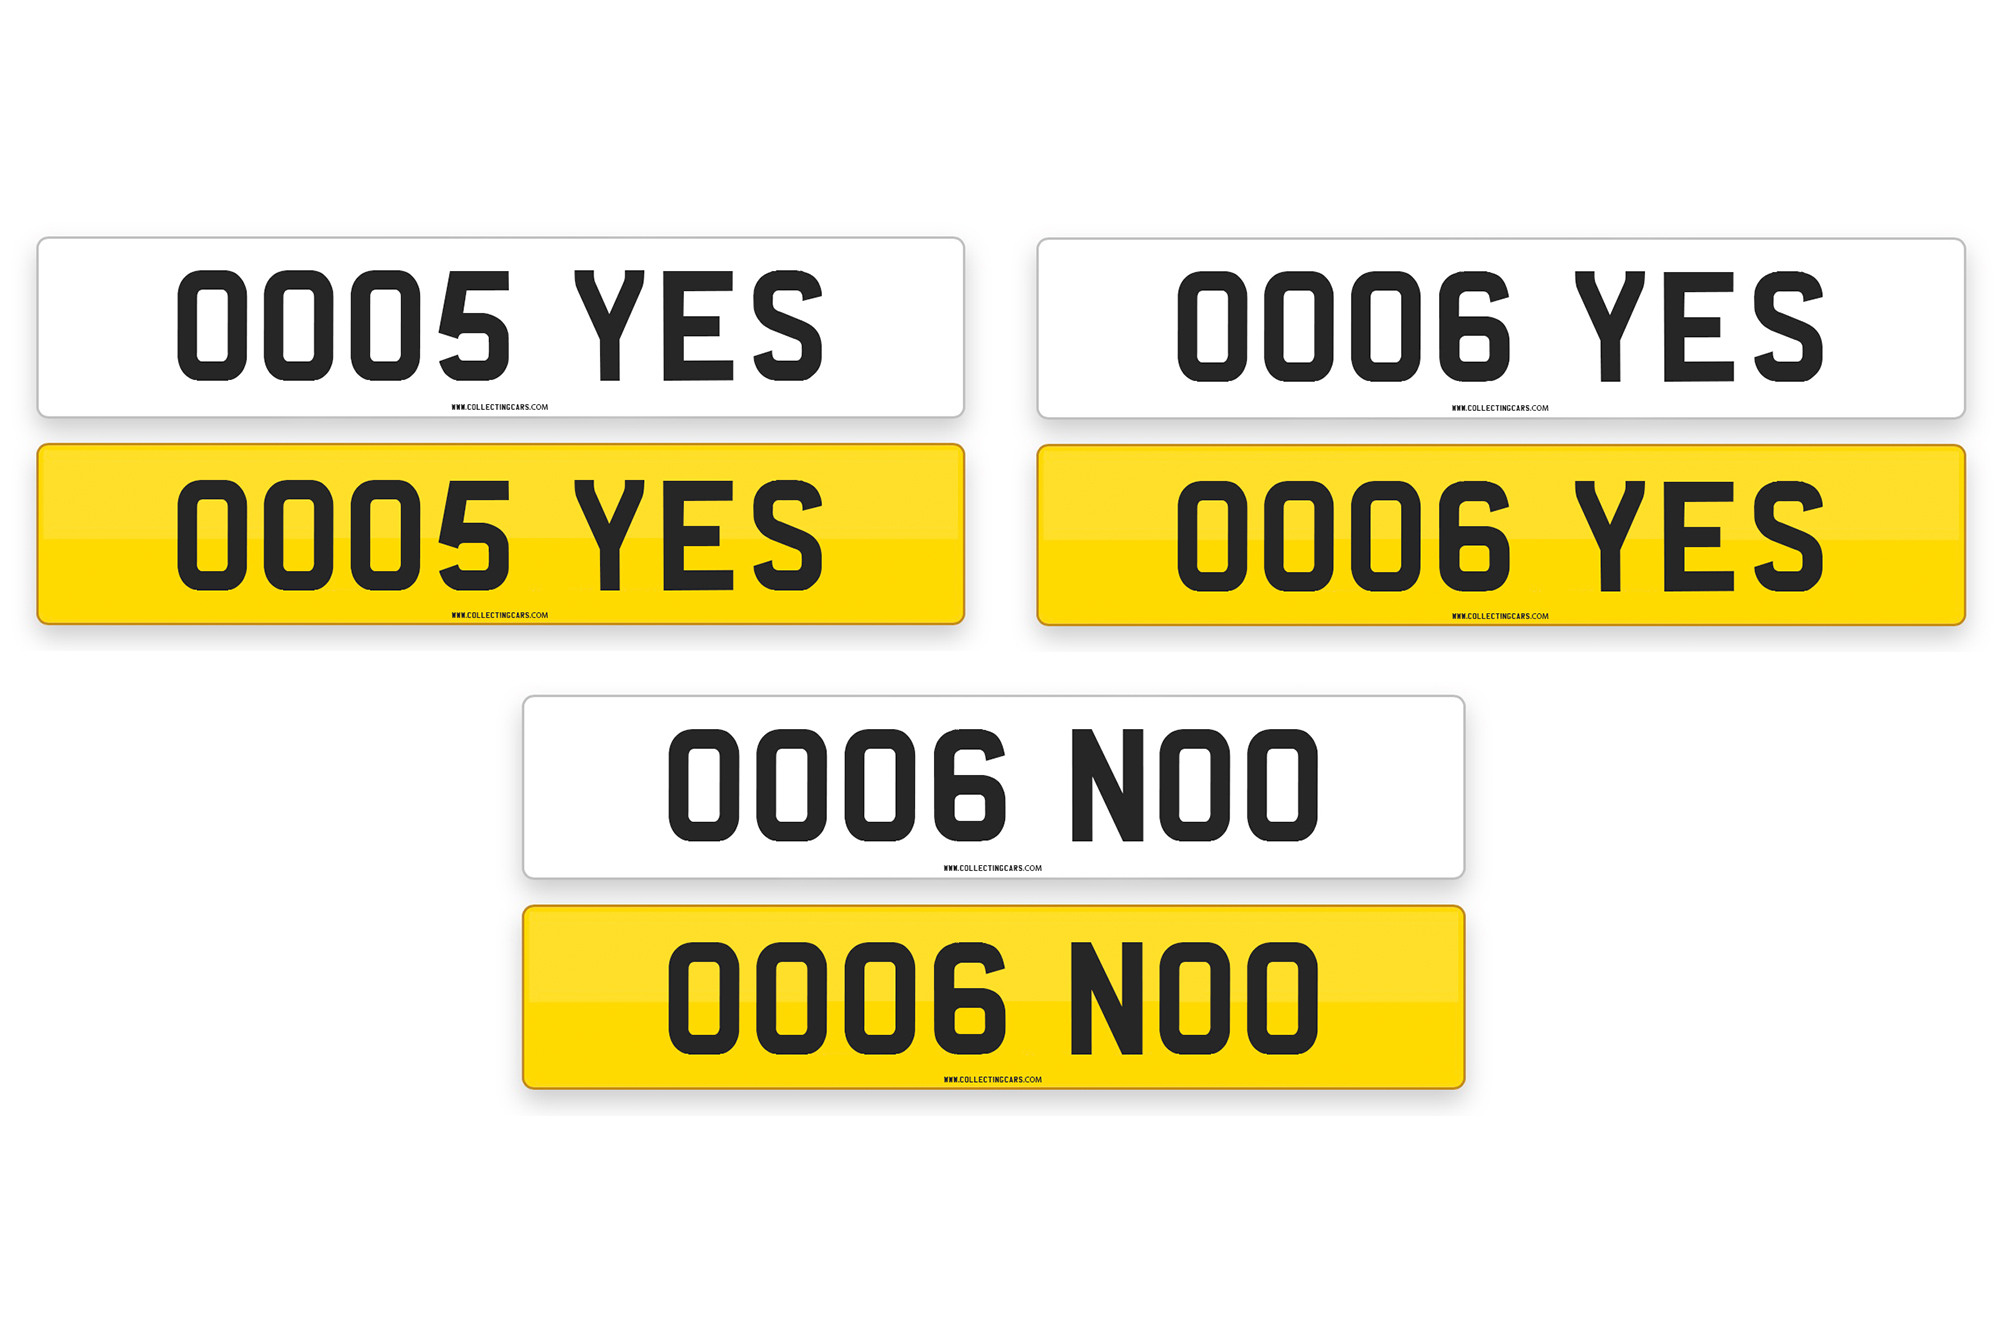 'OO05 YES', 'OO06 YES', 'OO06 NOO' - NUMBER PLATES